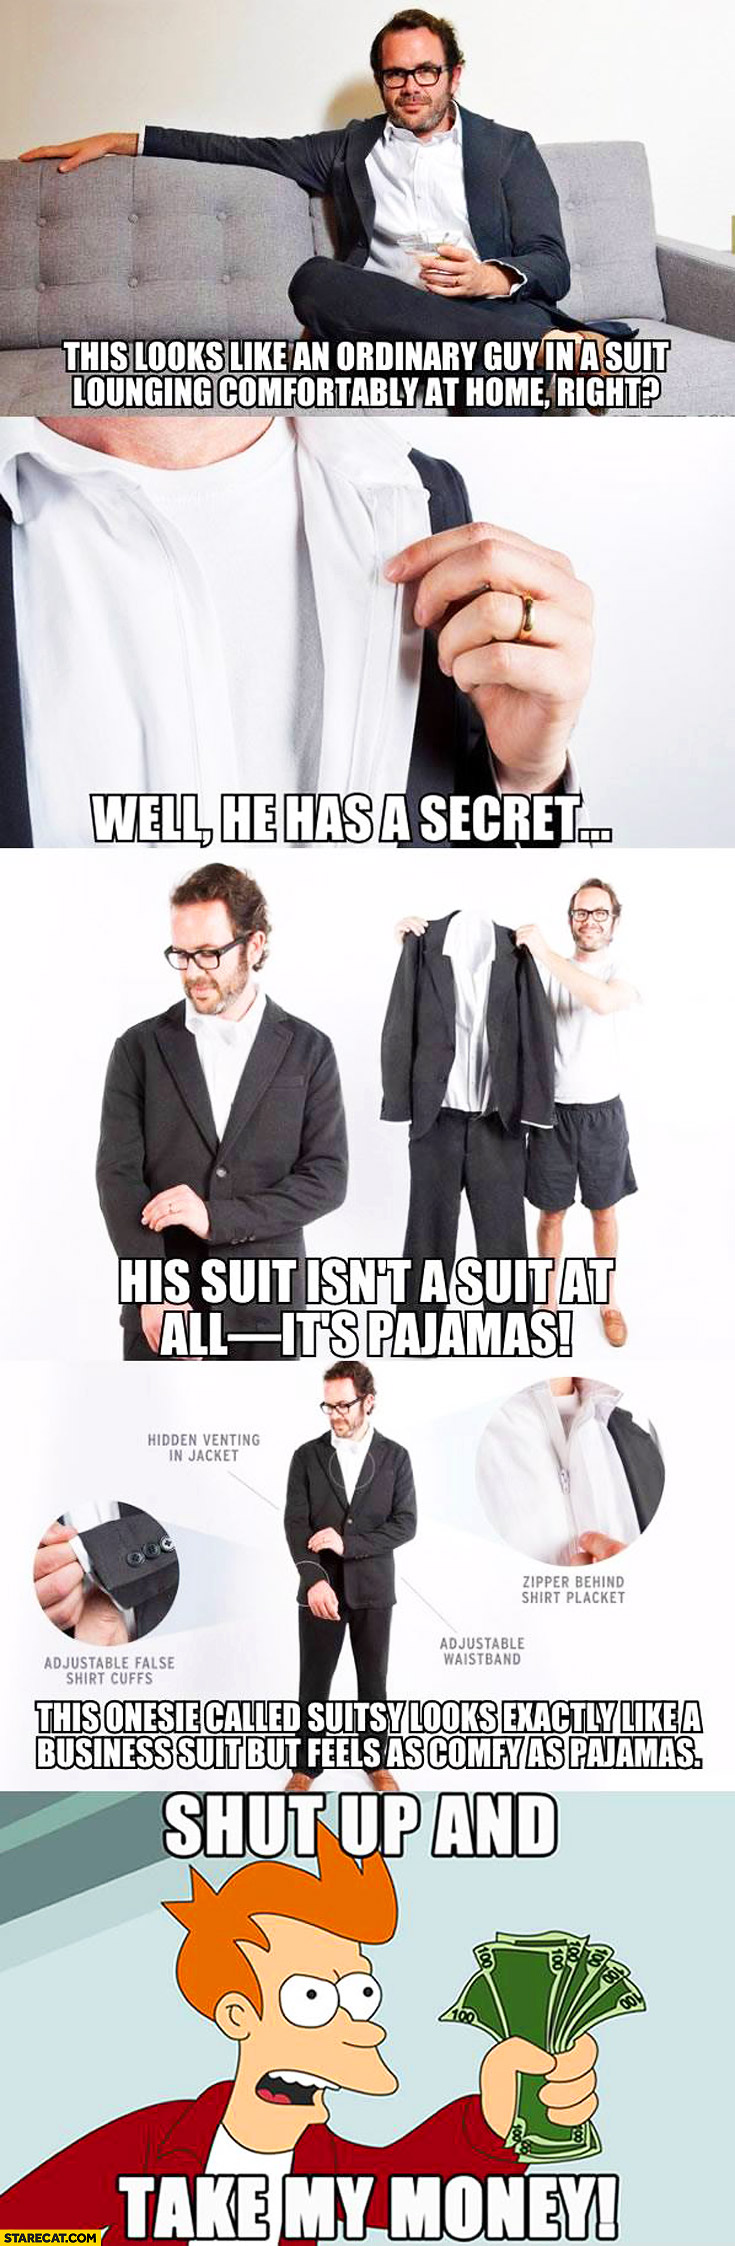 Mens pajamas looking like a suit